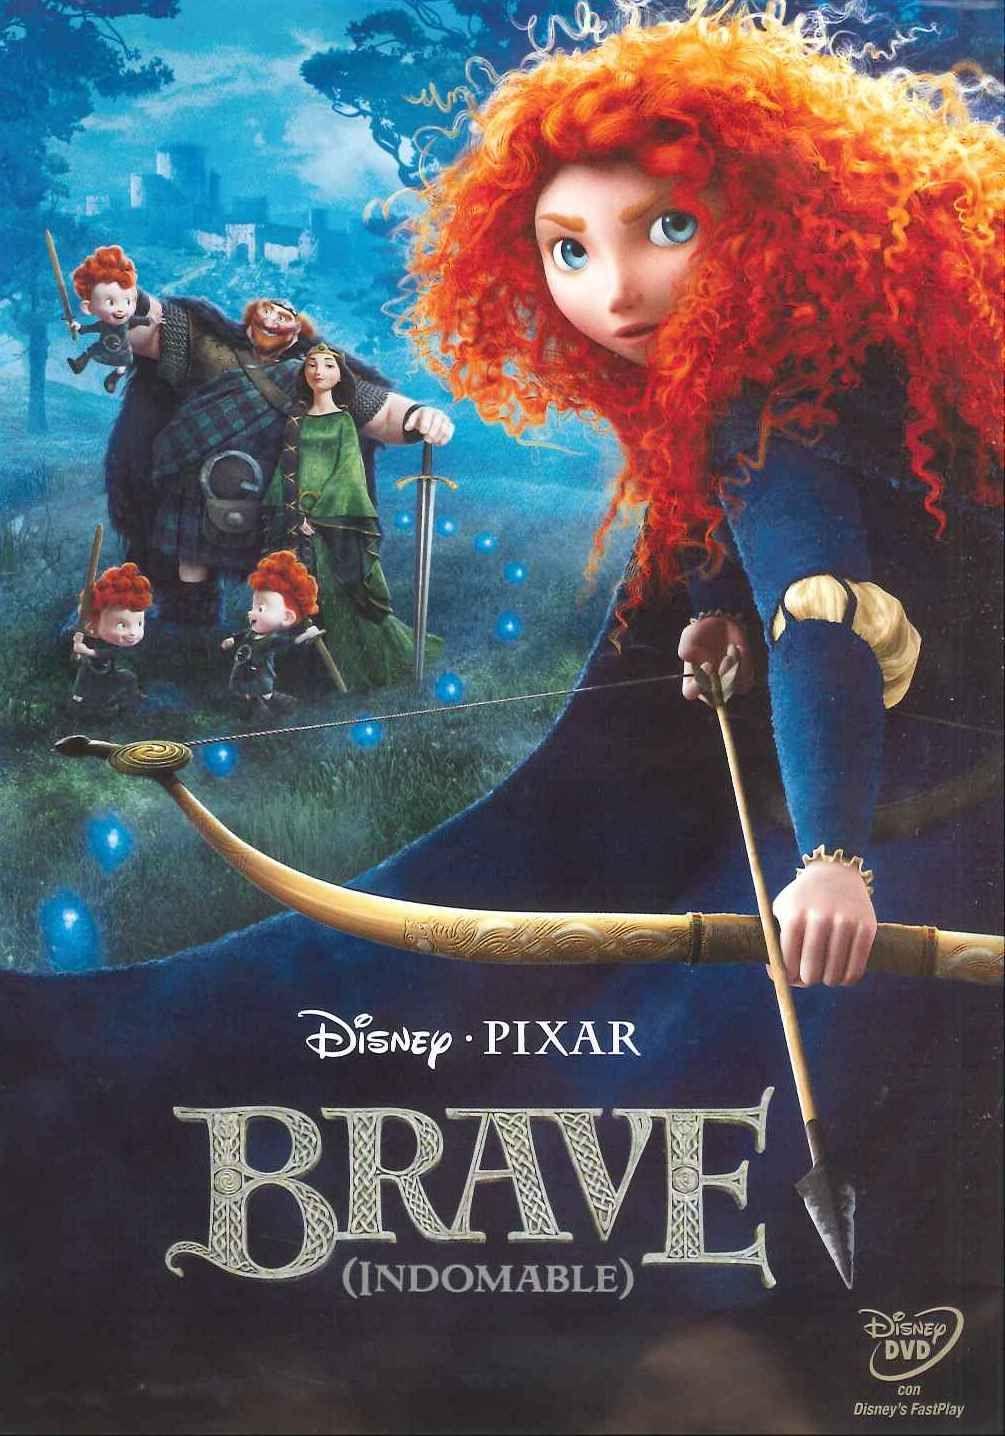 Brave Indomable Dvd Peliculas De Disney Peliculas De Pixar Peliculas Infantiles De Disney